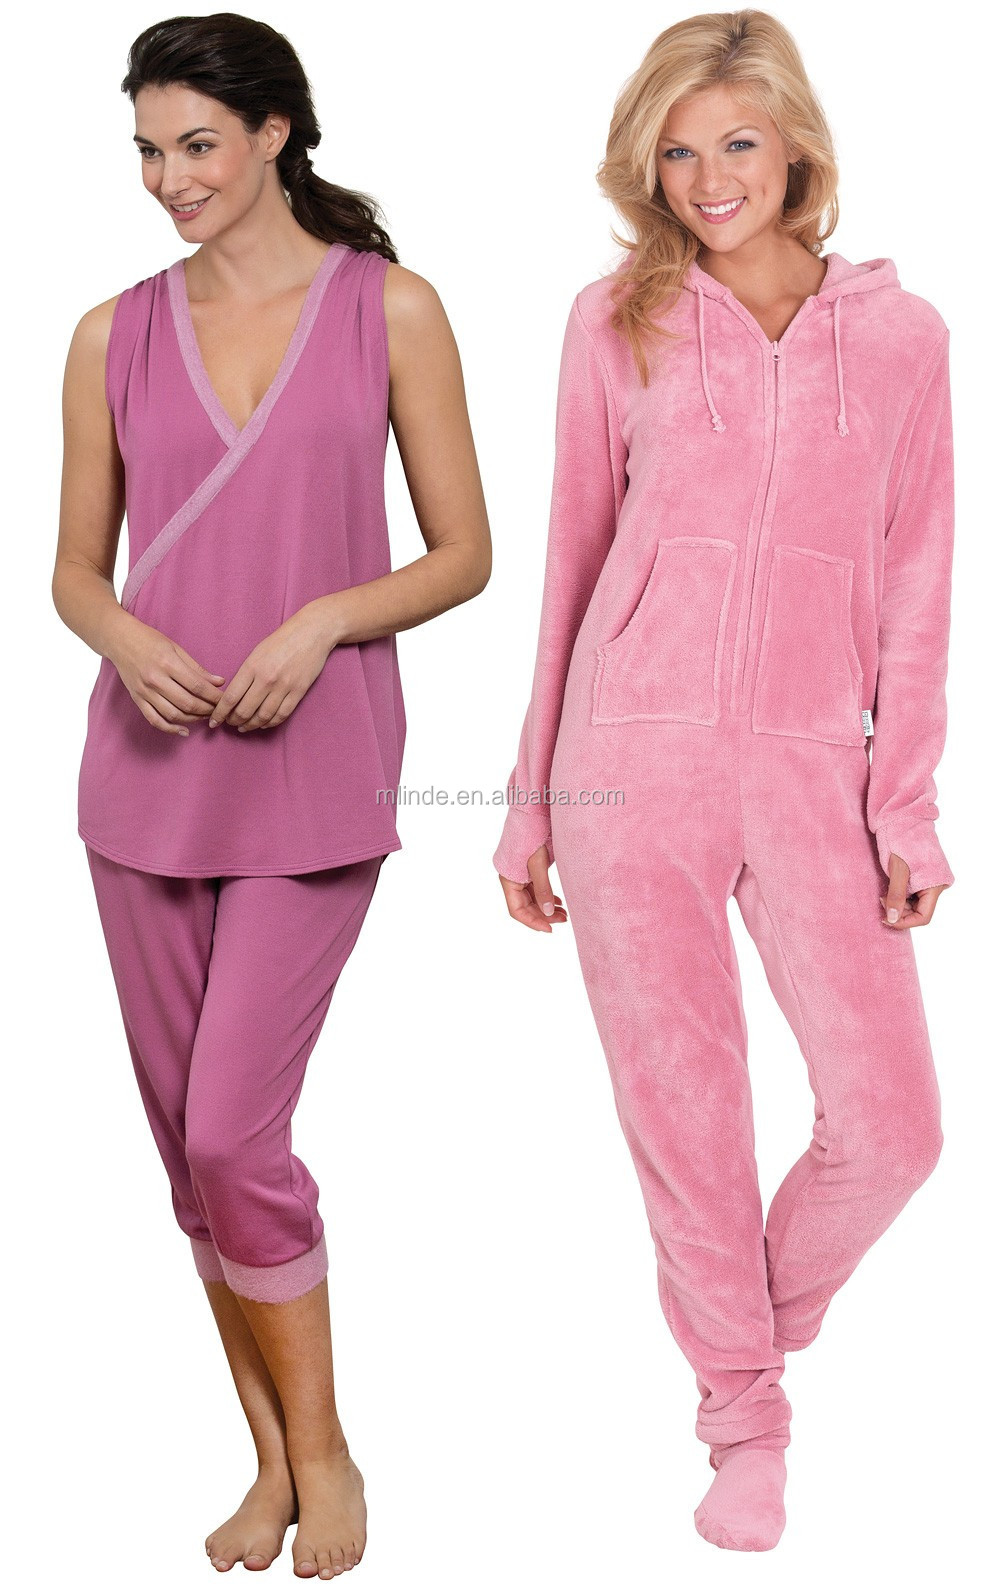 a2925d4a3a Custom Printed Pajamas Lightweight Soft Tank   Capri Lounge Set   Pink  Hoodie-Footie Pajamas Sleepwear Women